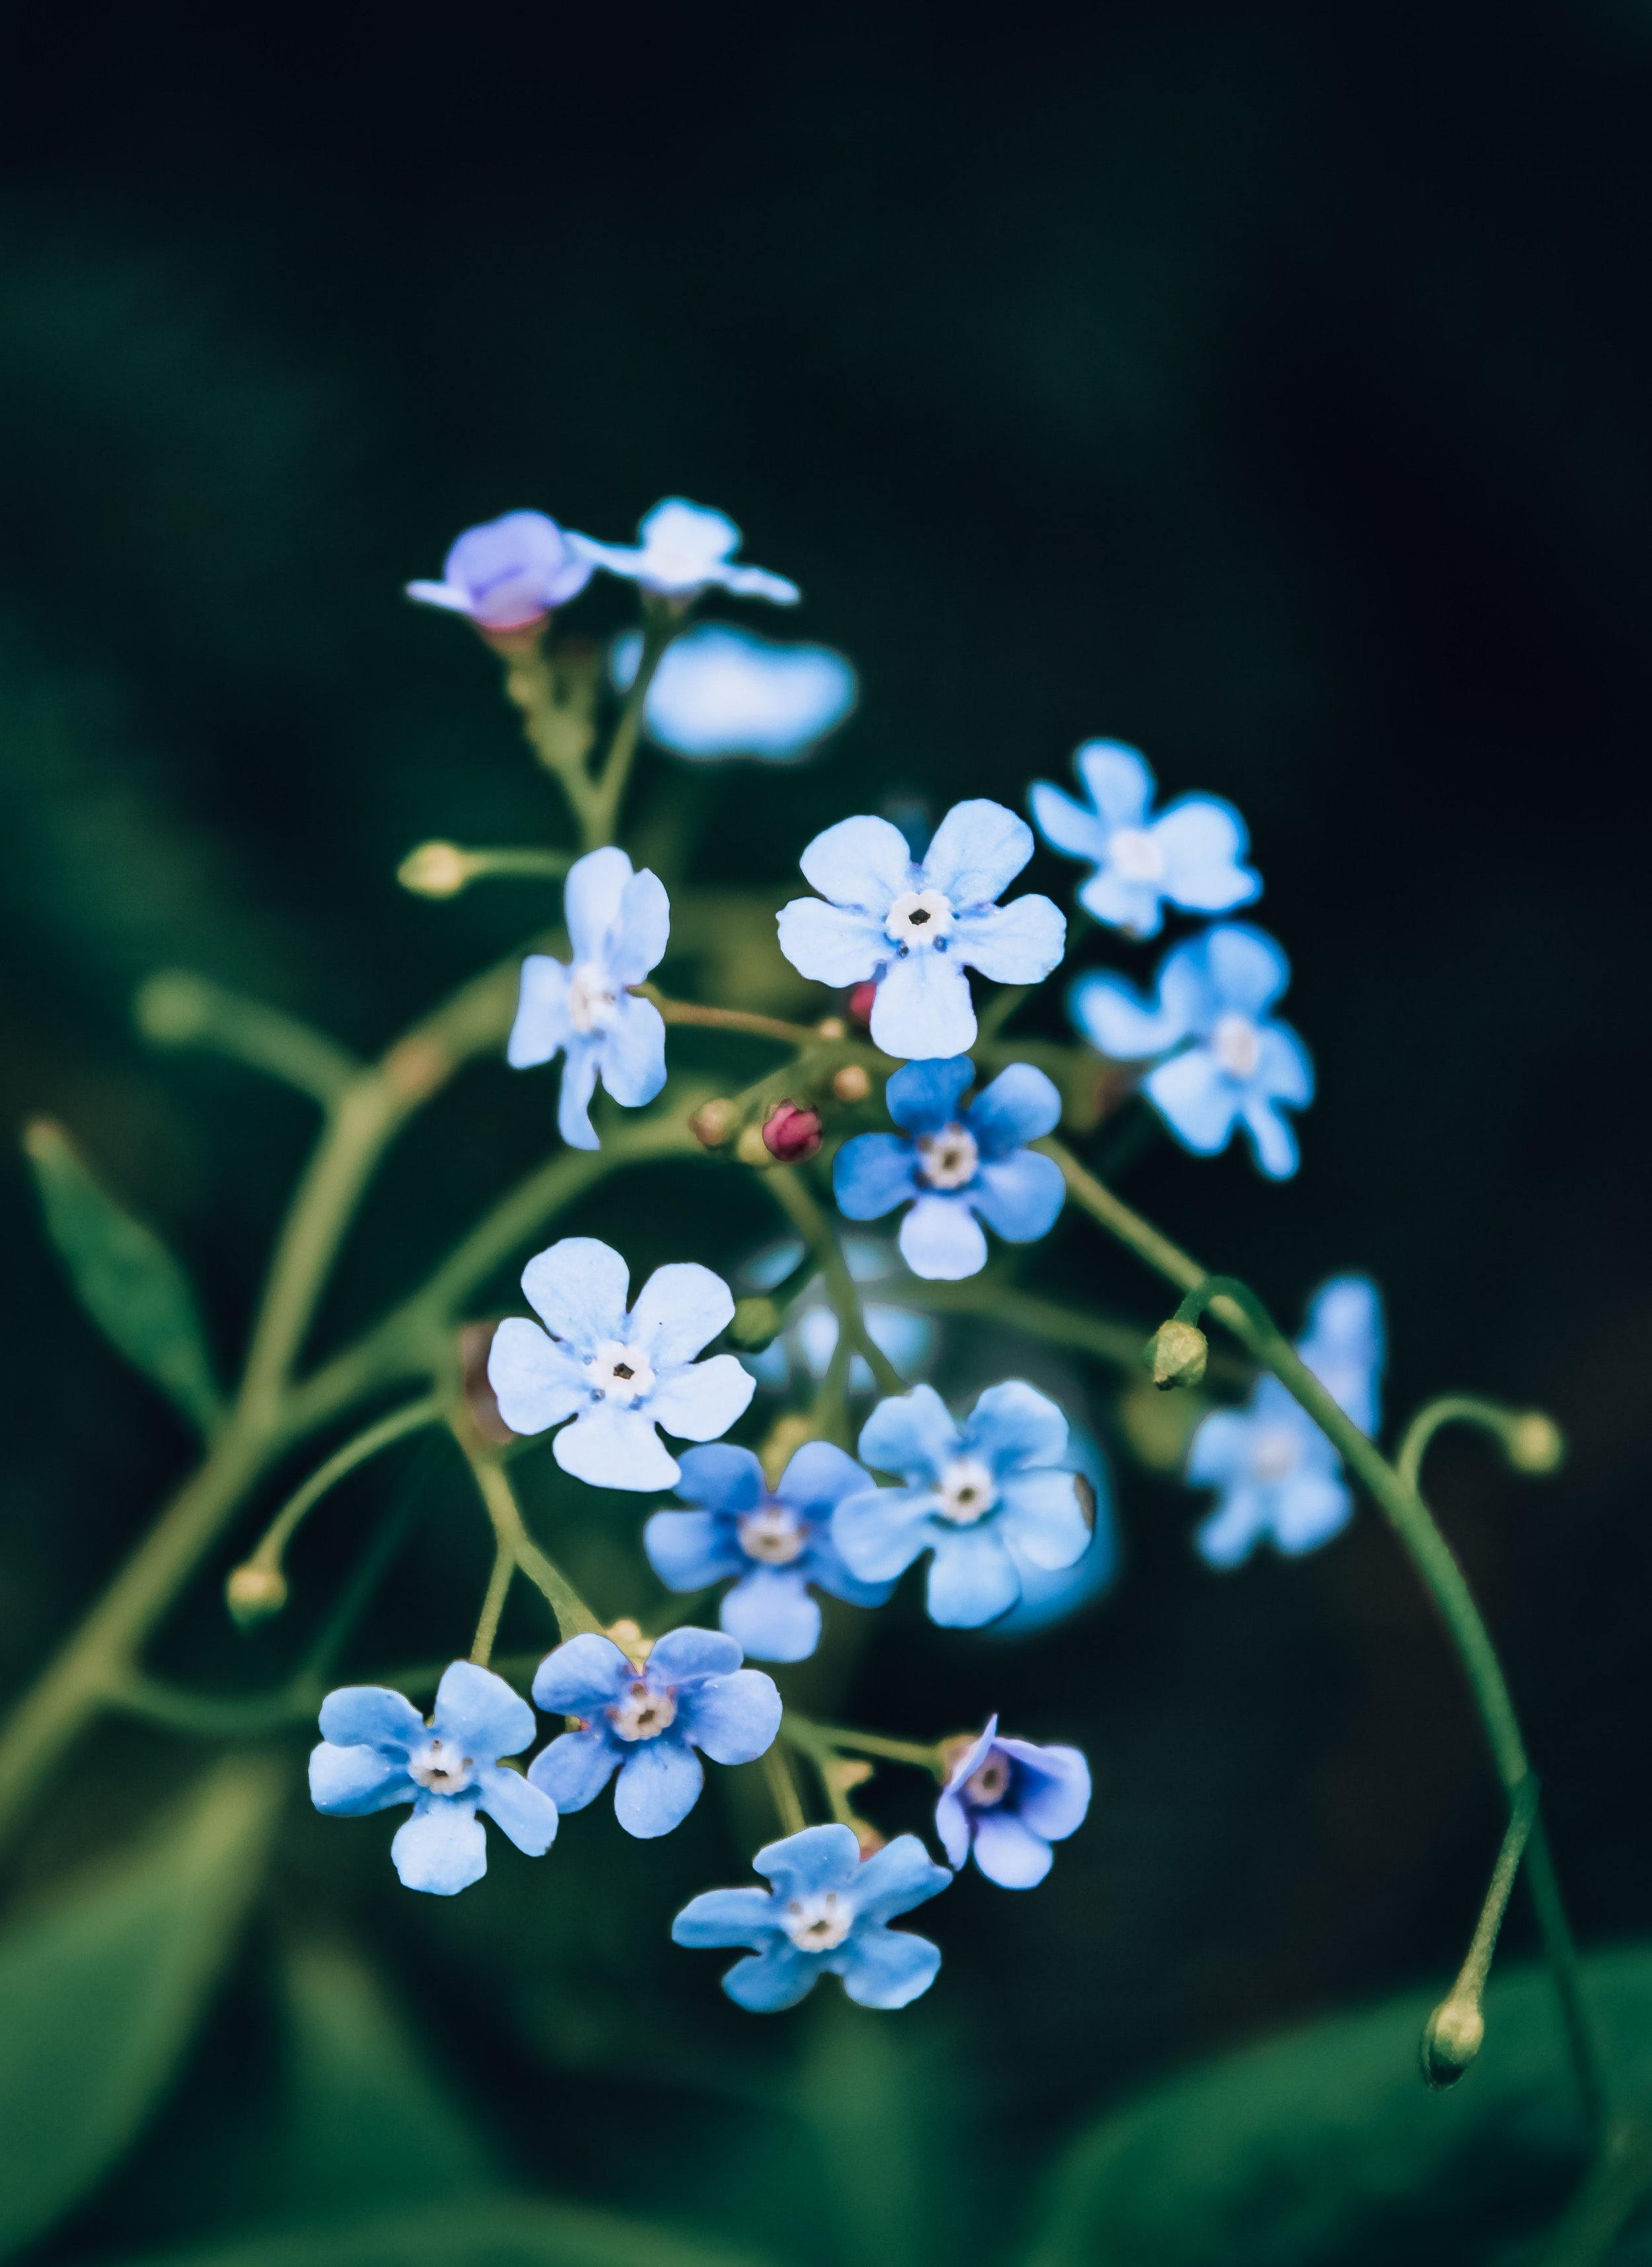 alpine-forget-me-not-beautiful-blossom-2379476.jpg